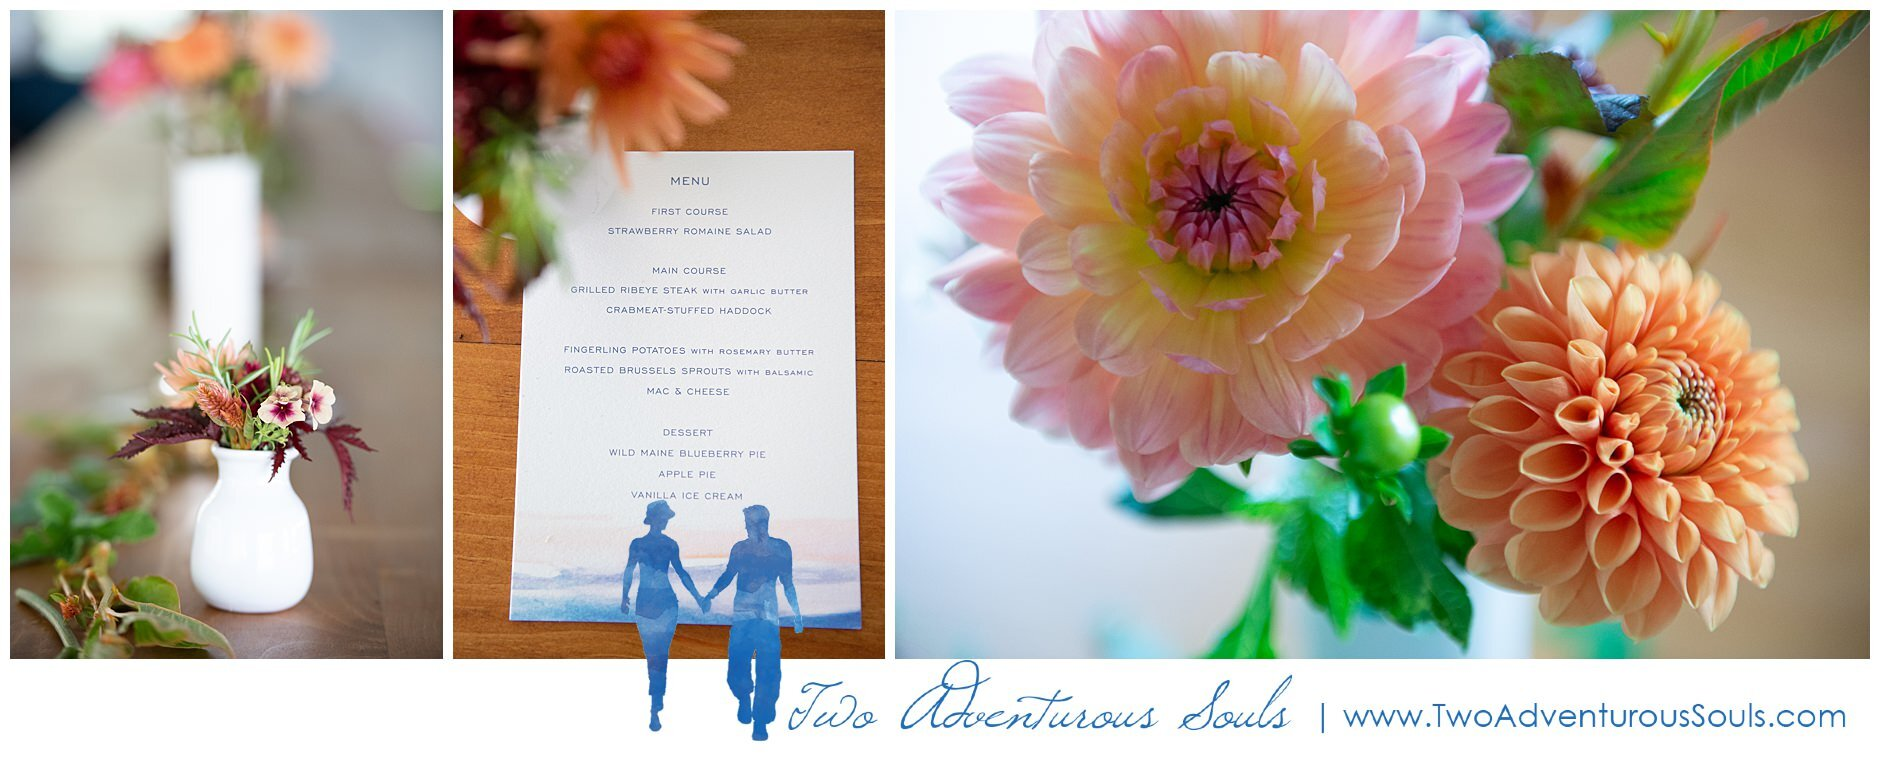 Bar Harbor Wedding Photographers, Acadia Bay Inn Wedding Photographers, Two Adventurous Souls- 091419_0002.jpg